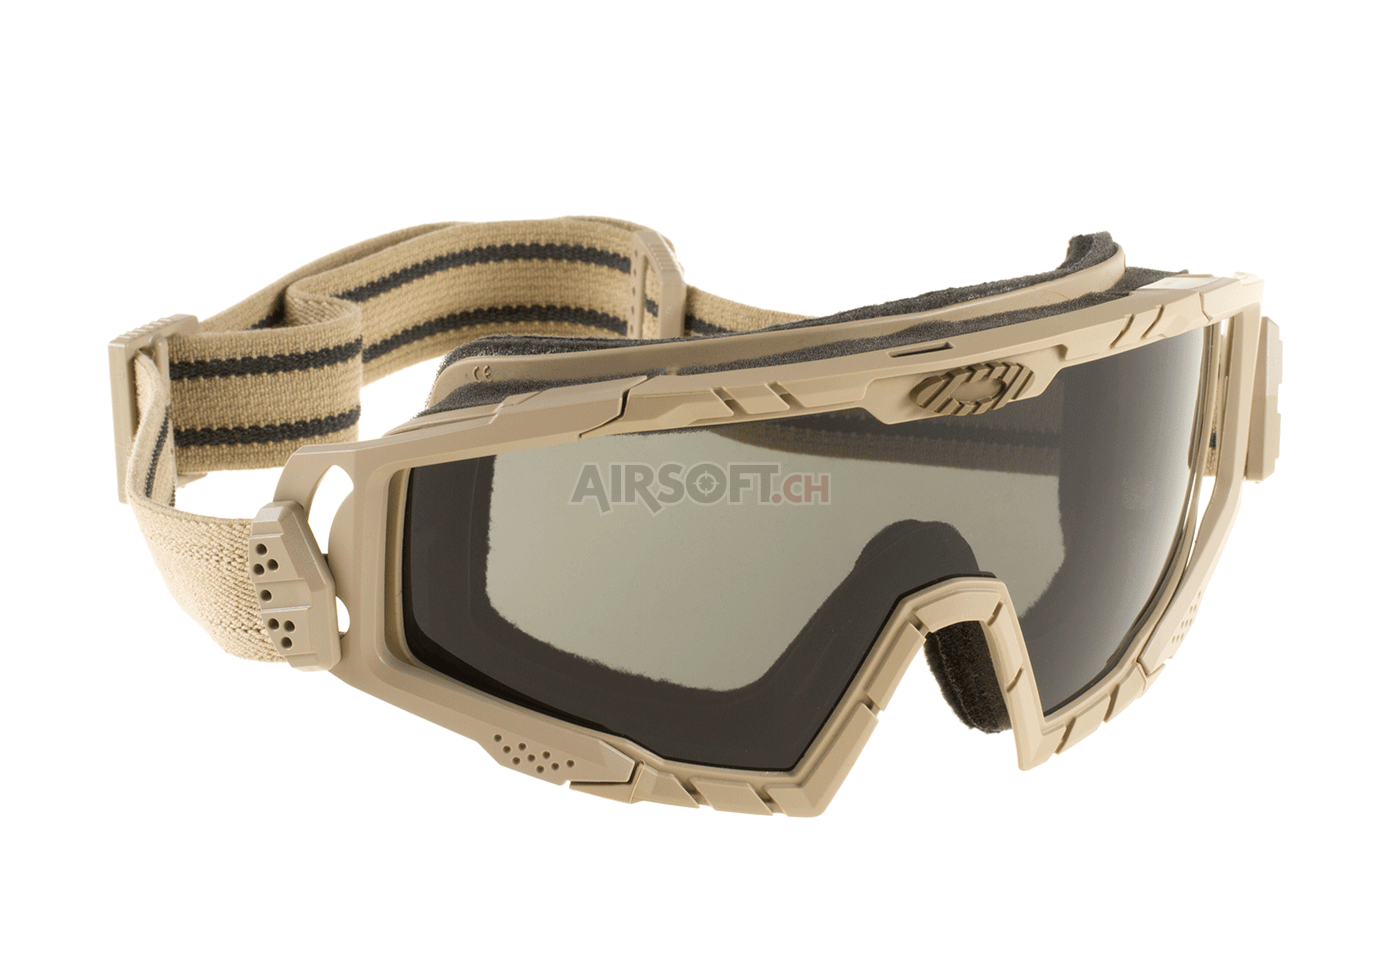 5a7249769d0 Oakley Airsoft Goggles « Heritage Malta